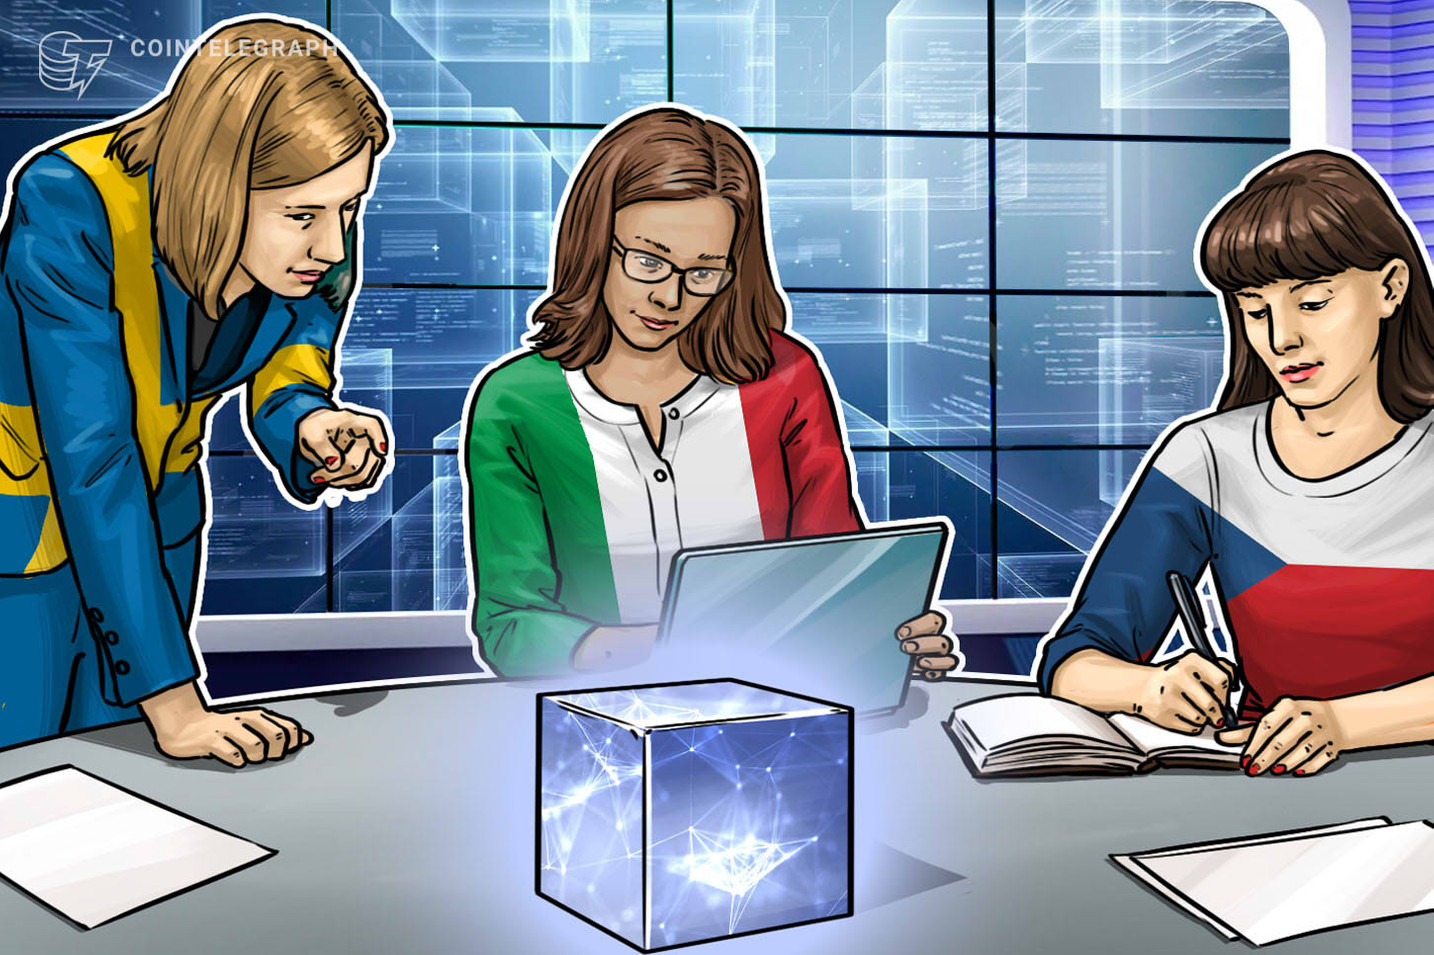 Italy, Sweden, and Czechia to Lead European Blockchain Partnership